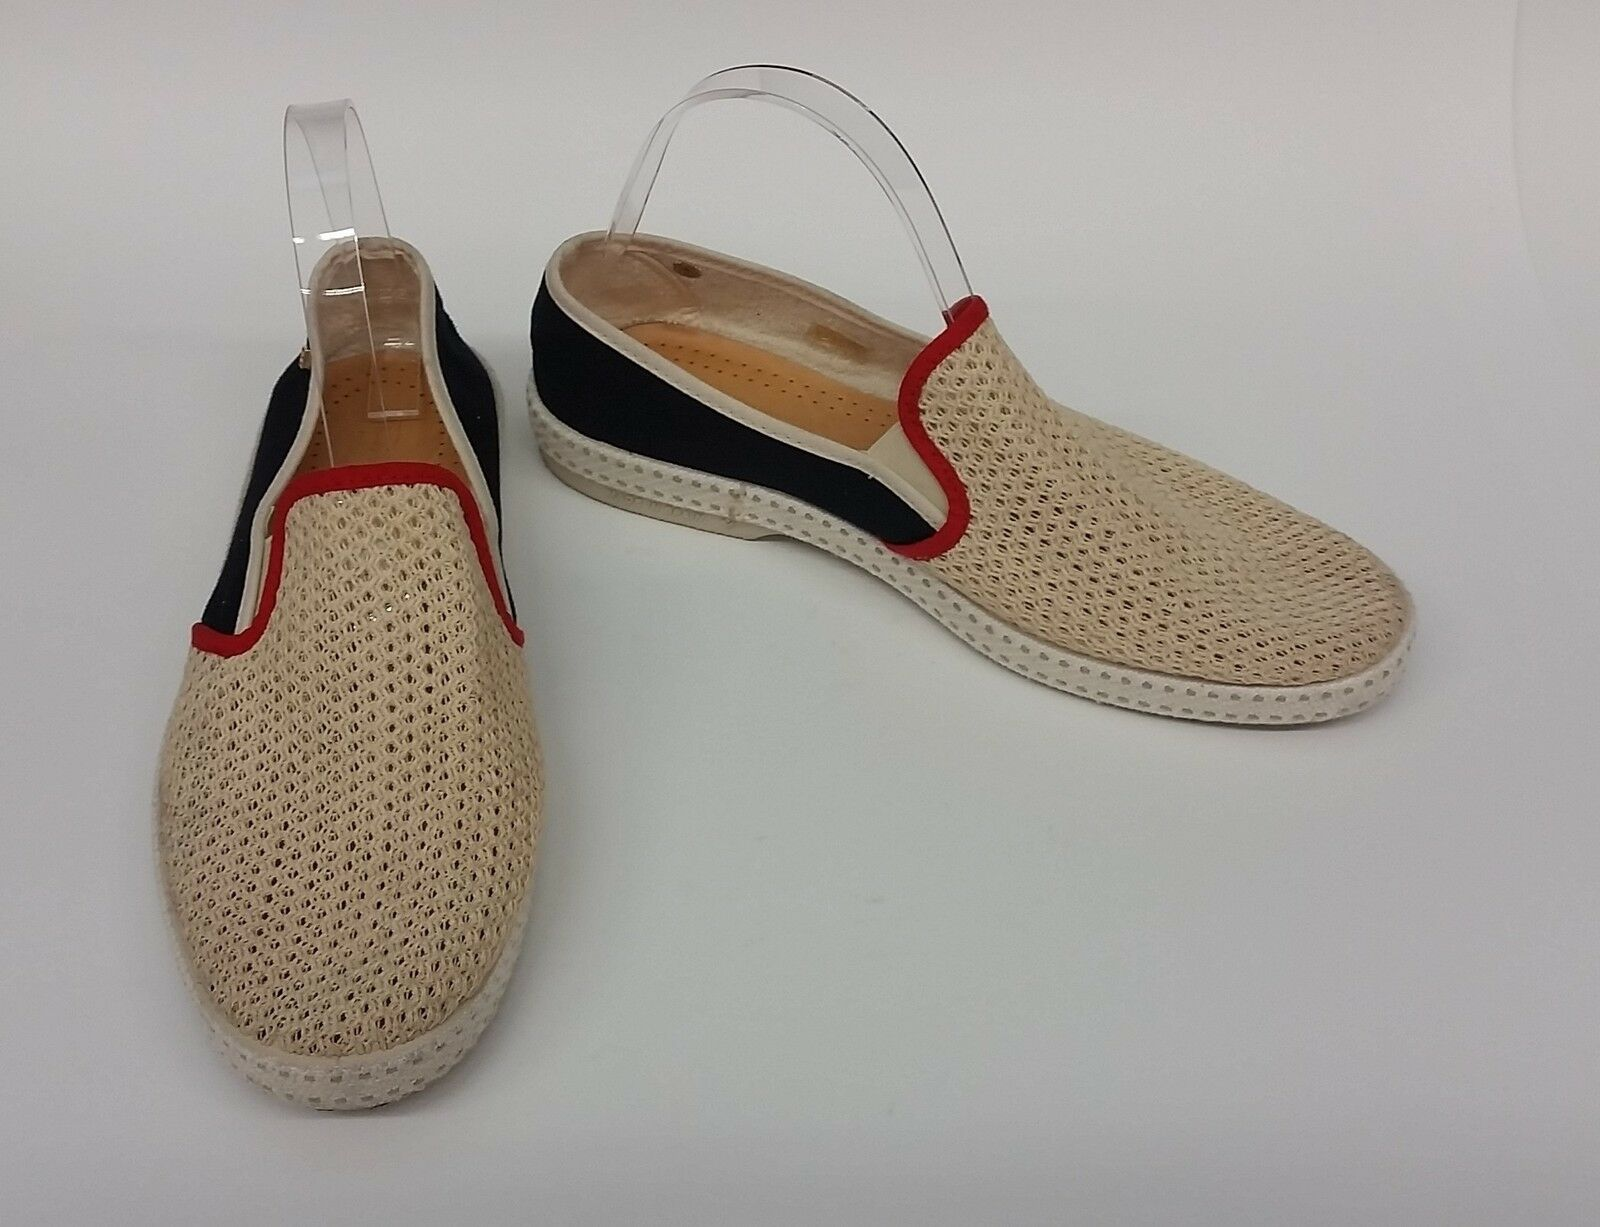 Rivieras Schuhes Flats Cream Blau ROT Slip On Sneakers Mesh Größe US 10.5 EU 41